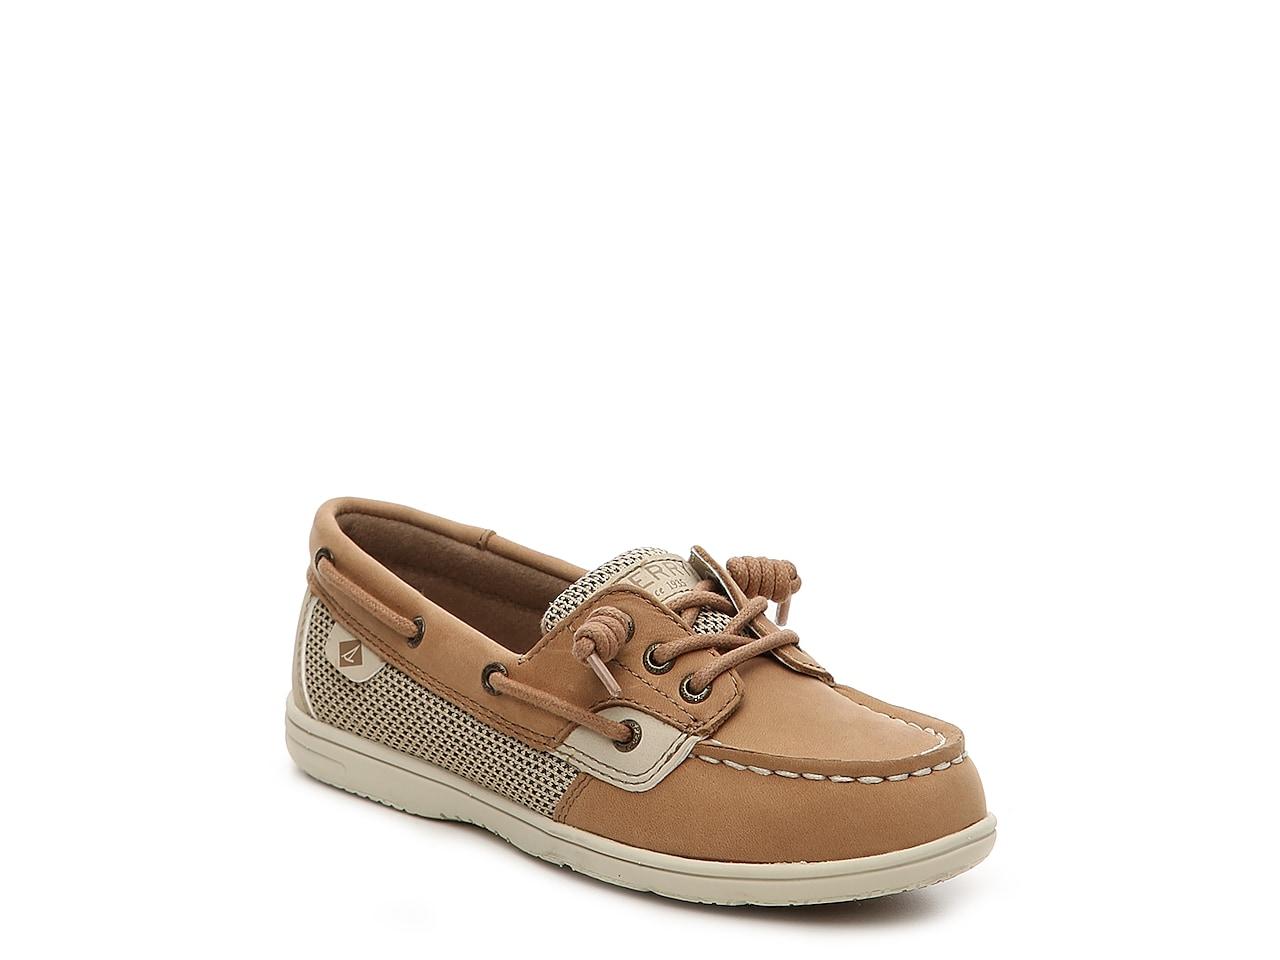 Sperry Kids Shoresider Jr//Blue Boat Shoe